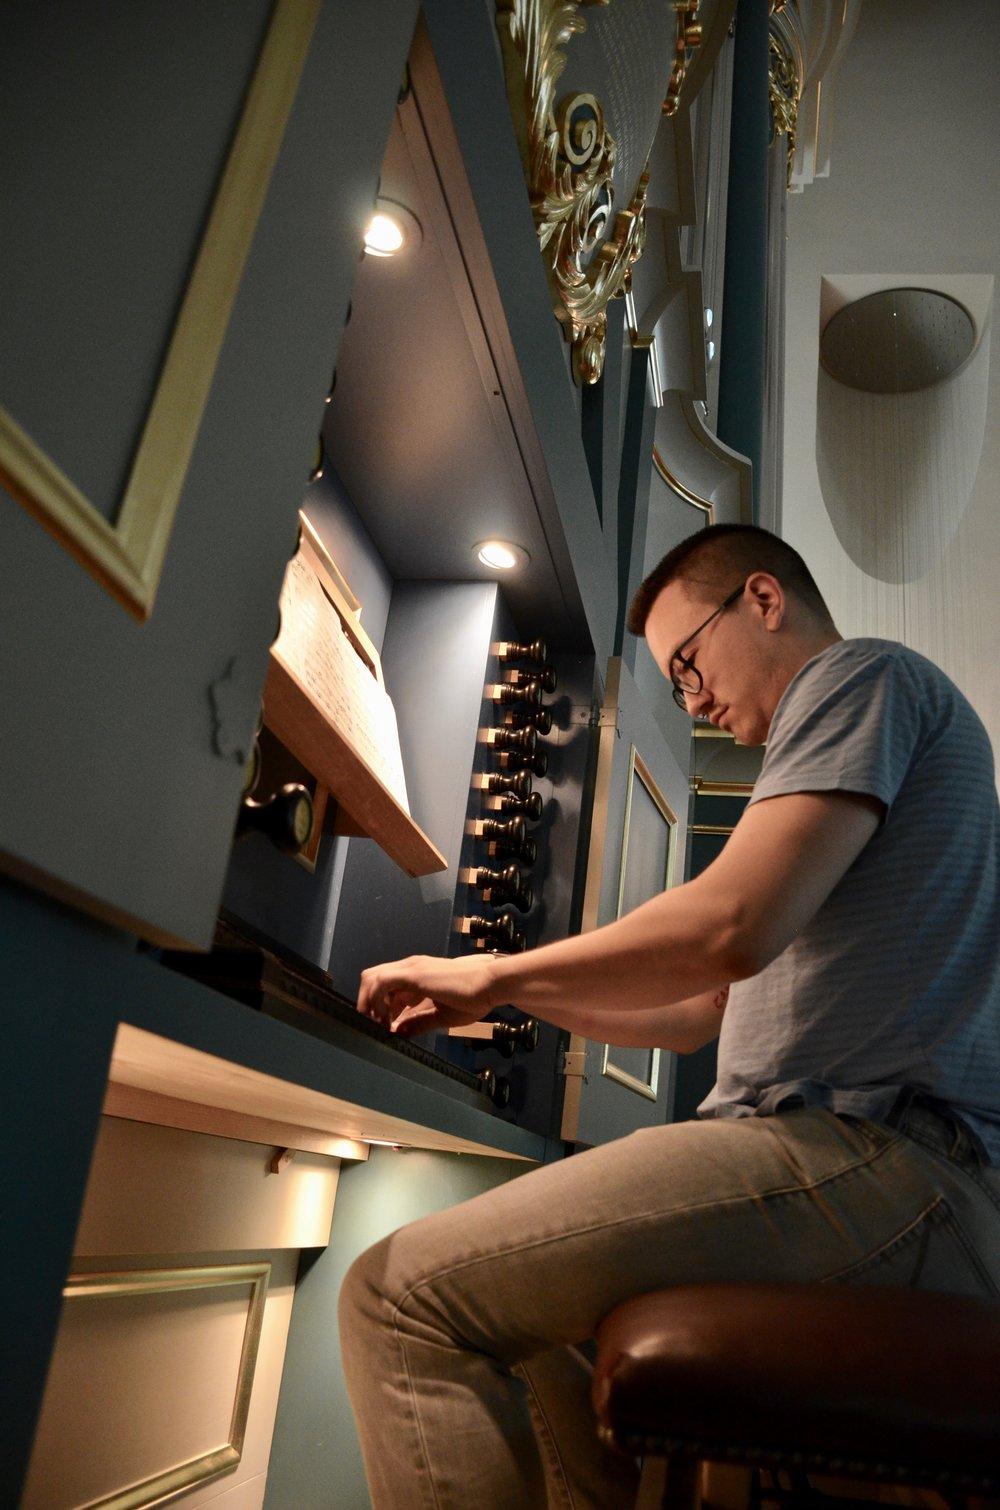 Corey De Tar at the console of the Baroque Organ in Orgelpark, Amsterdam. Boston Organ Studio.